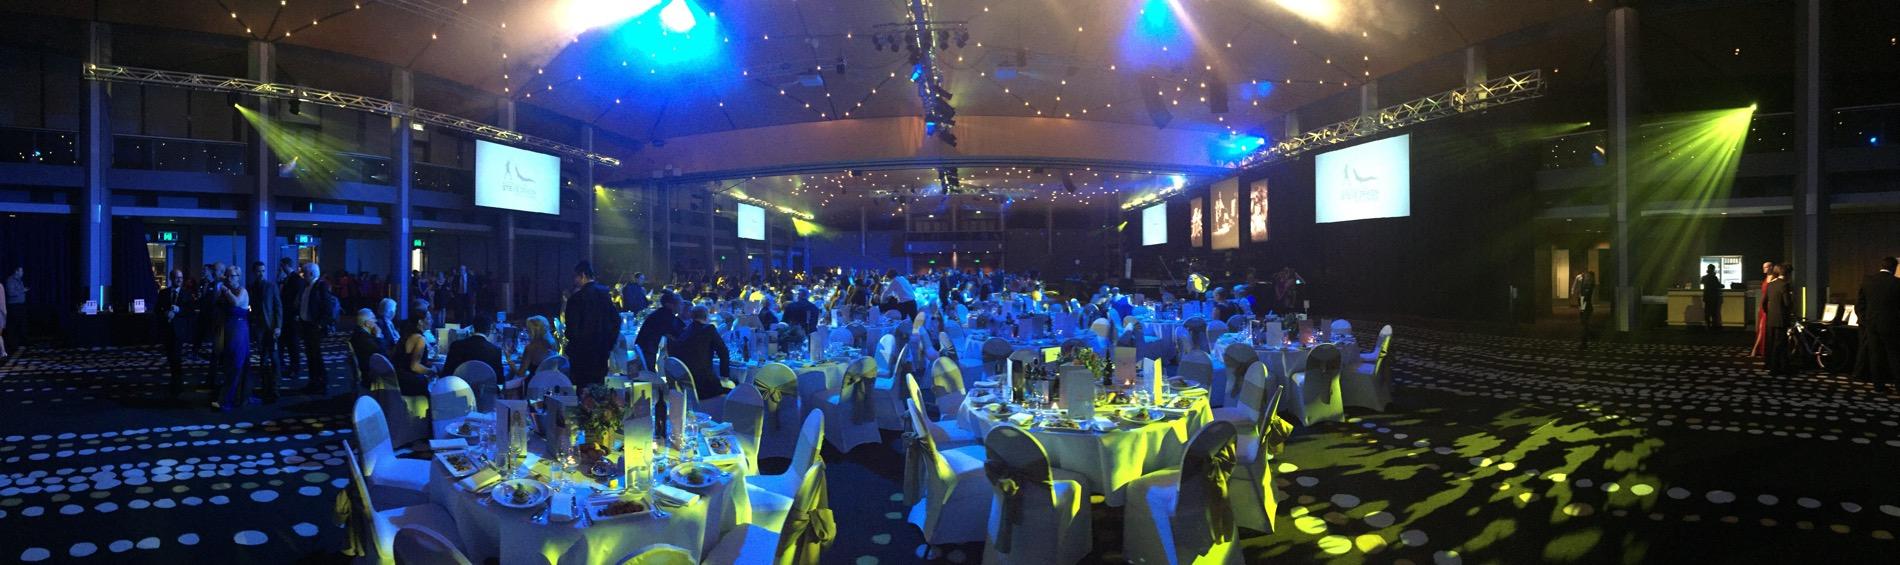 Minnik Chartered Accountants - Australia Zoo - australia-zoo-steve-irwin-gala-dinner-21st-november-2015